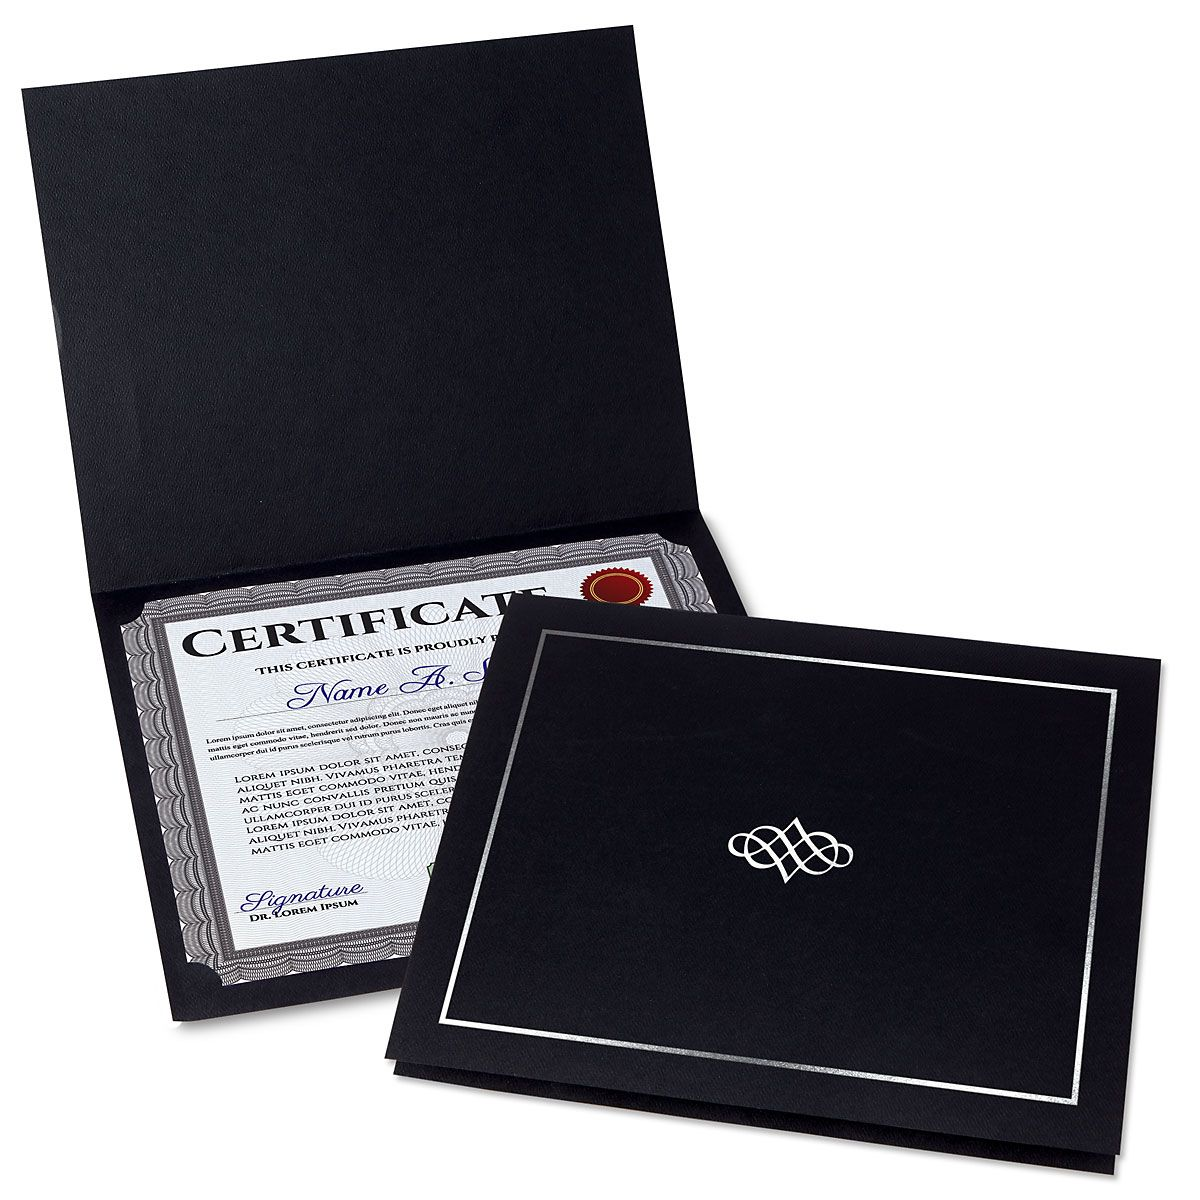 Ornate Black Certificate Folder with Silver Border/Crest